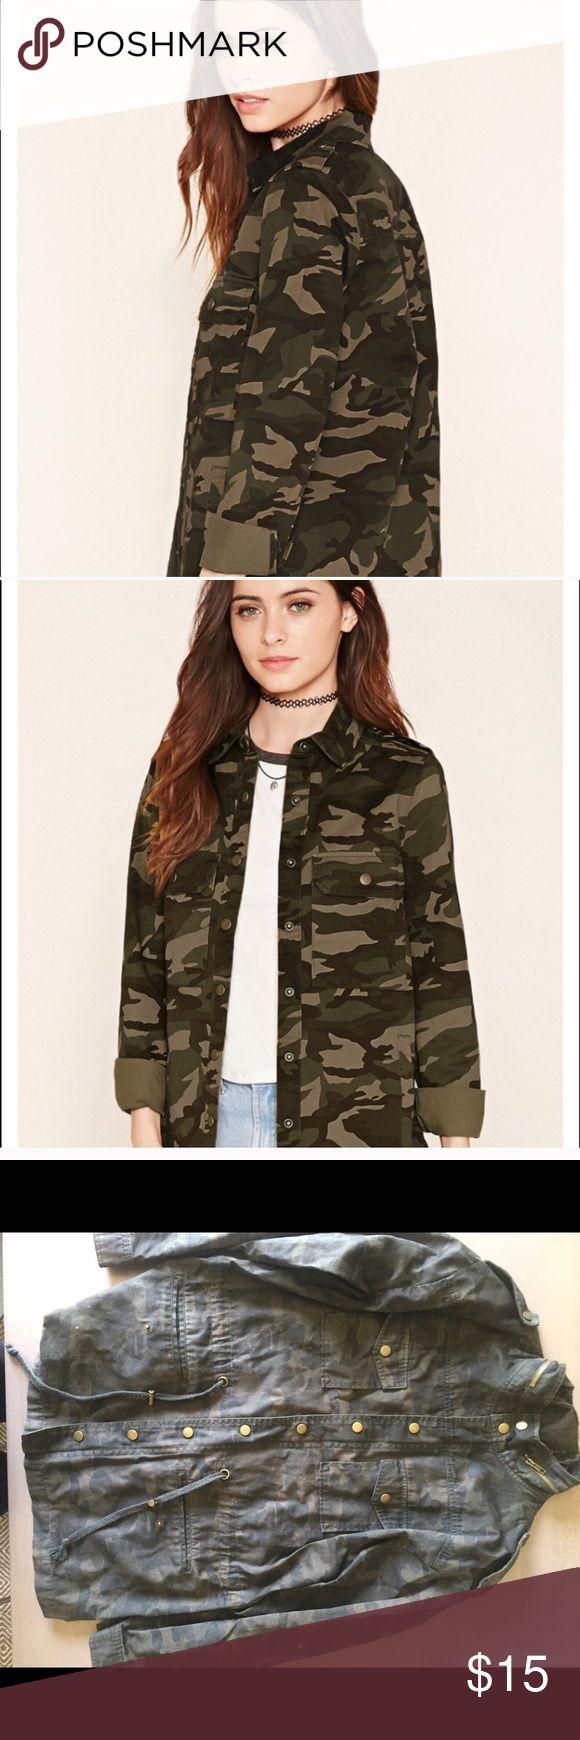 Forever 21 combat jacket Camouflage jacket forever 21 Forever 21 Jackets & Coats Jean Jackets